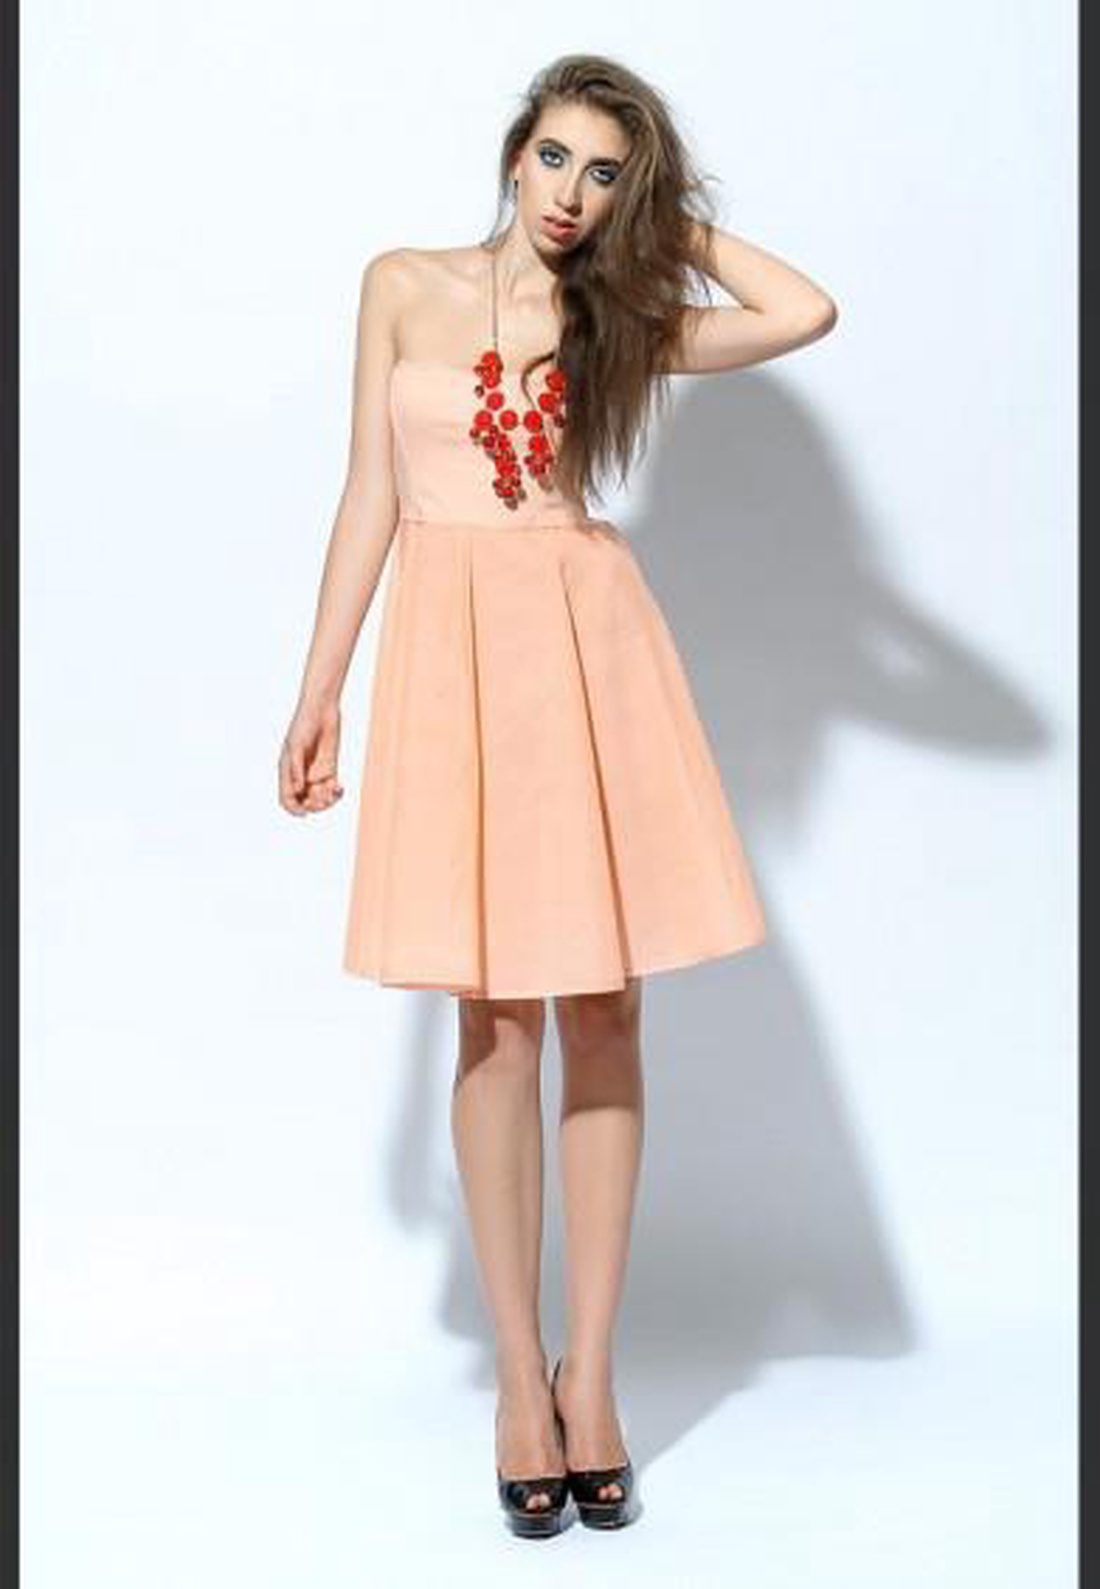 SALE! Barack színű női ruha (Eninied) - Meska.hu 83c06c080c